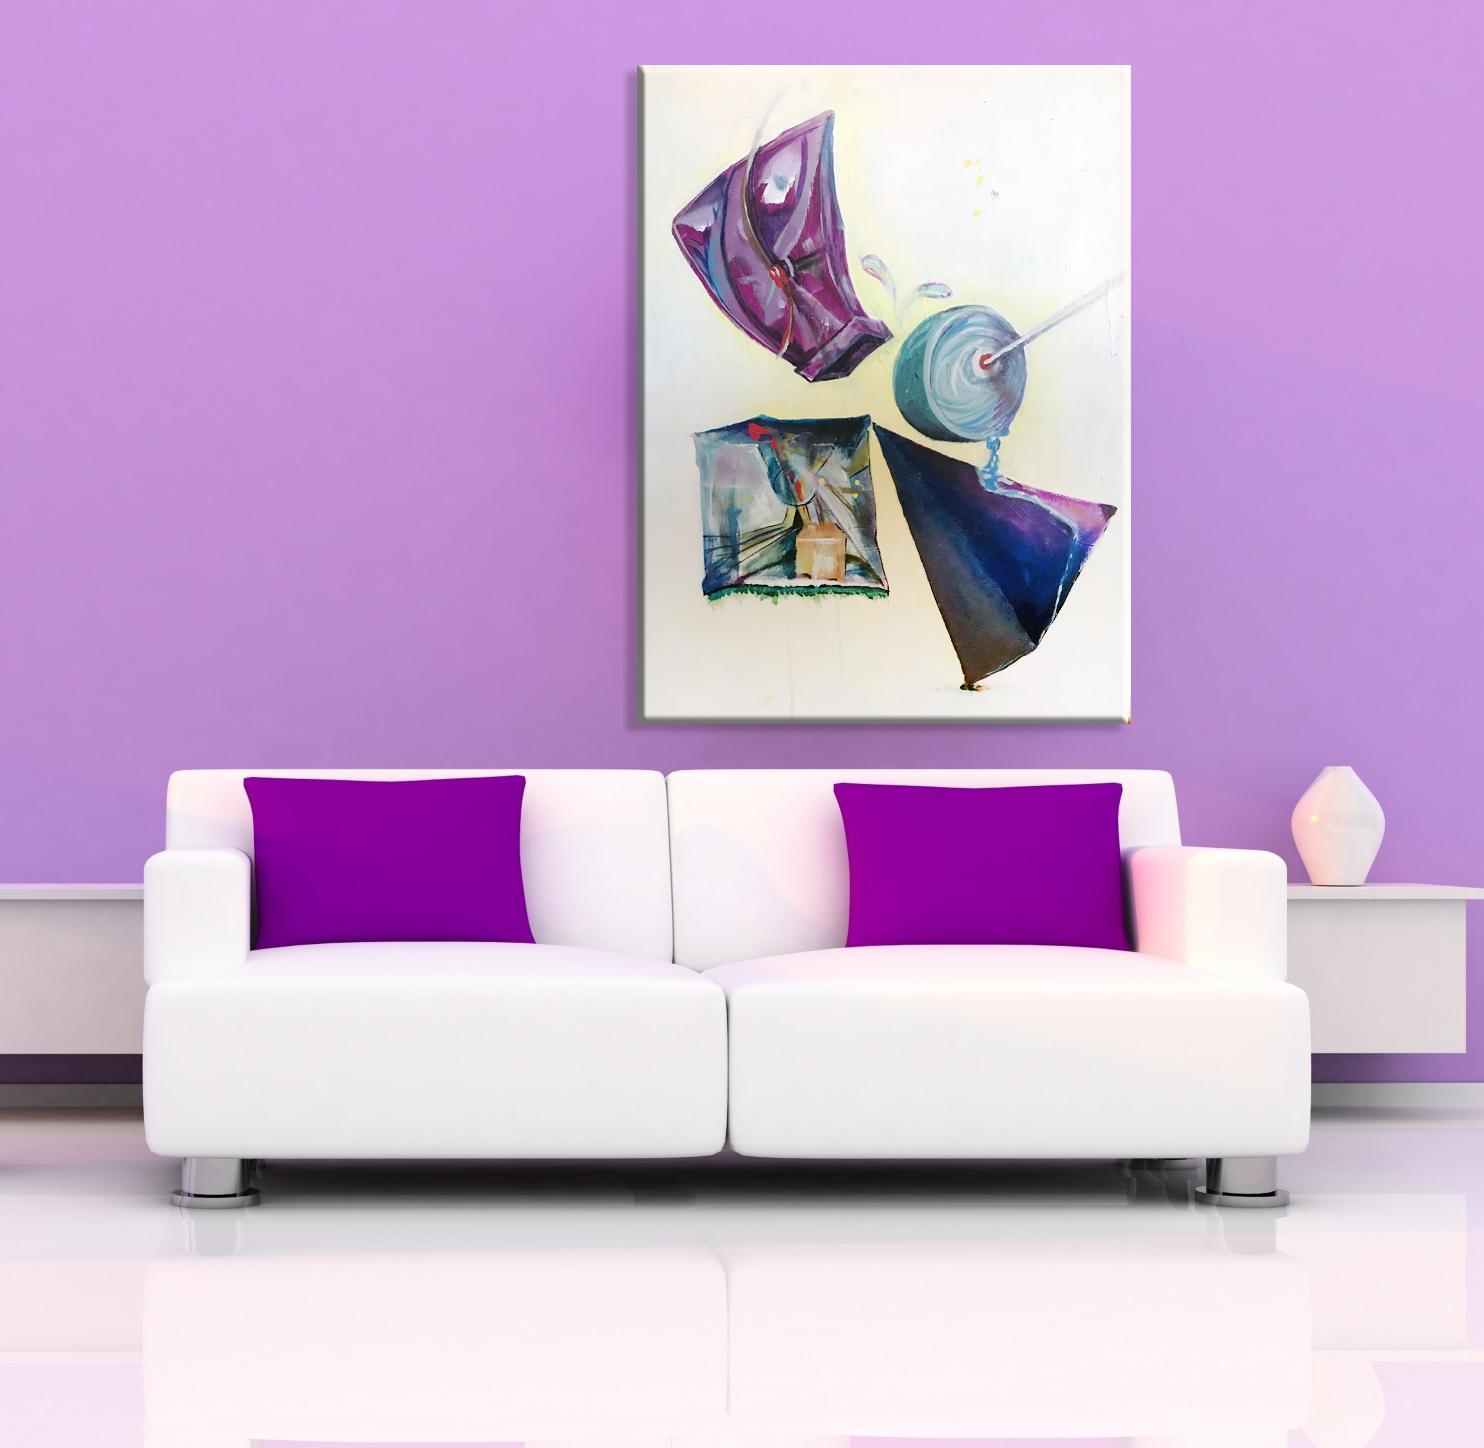 sofa-wallpaper-background-8850-9179-hd-wallpapers.jpg